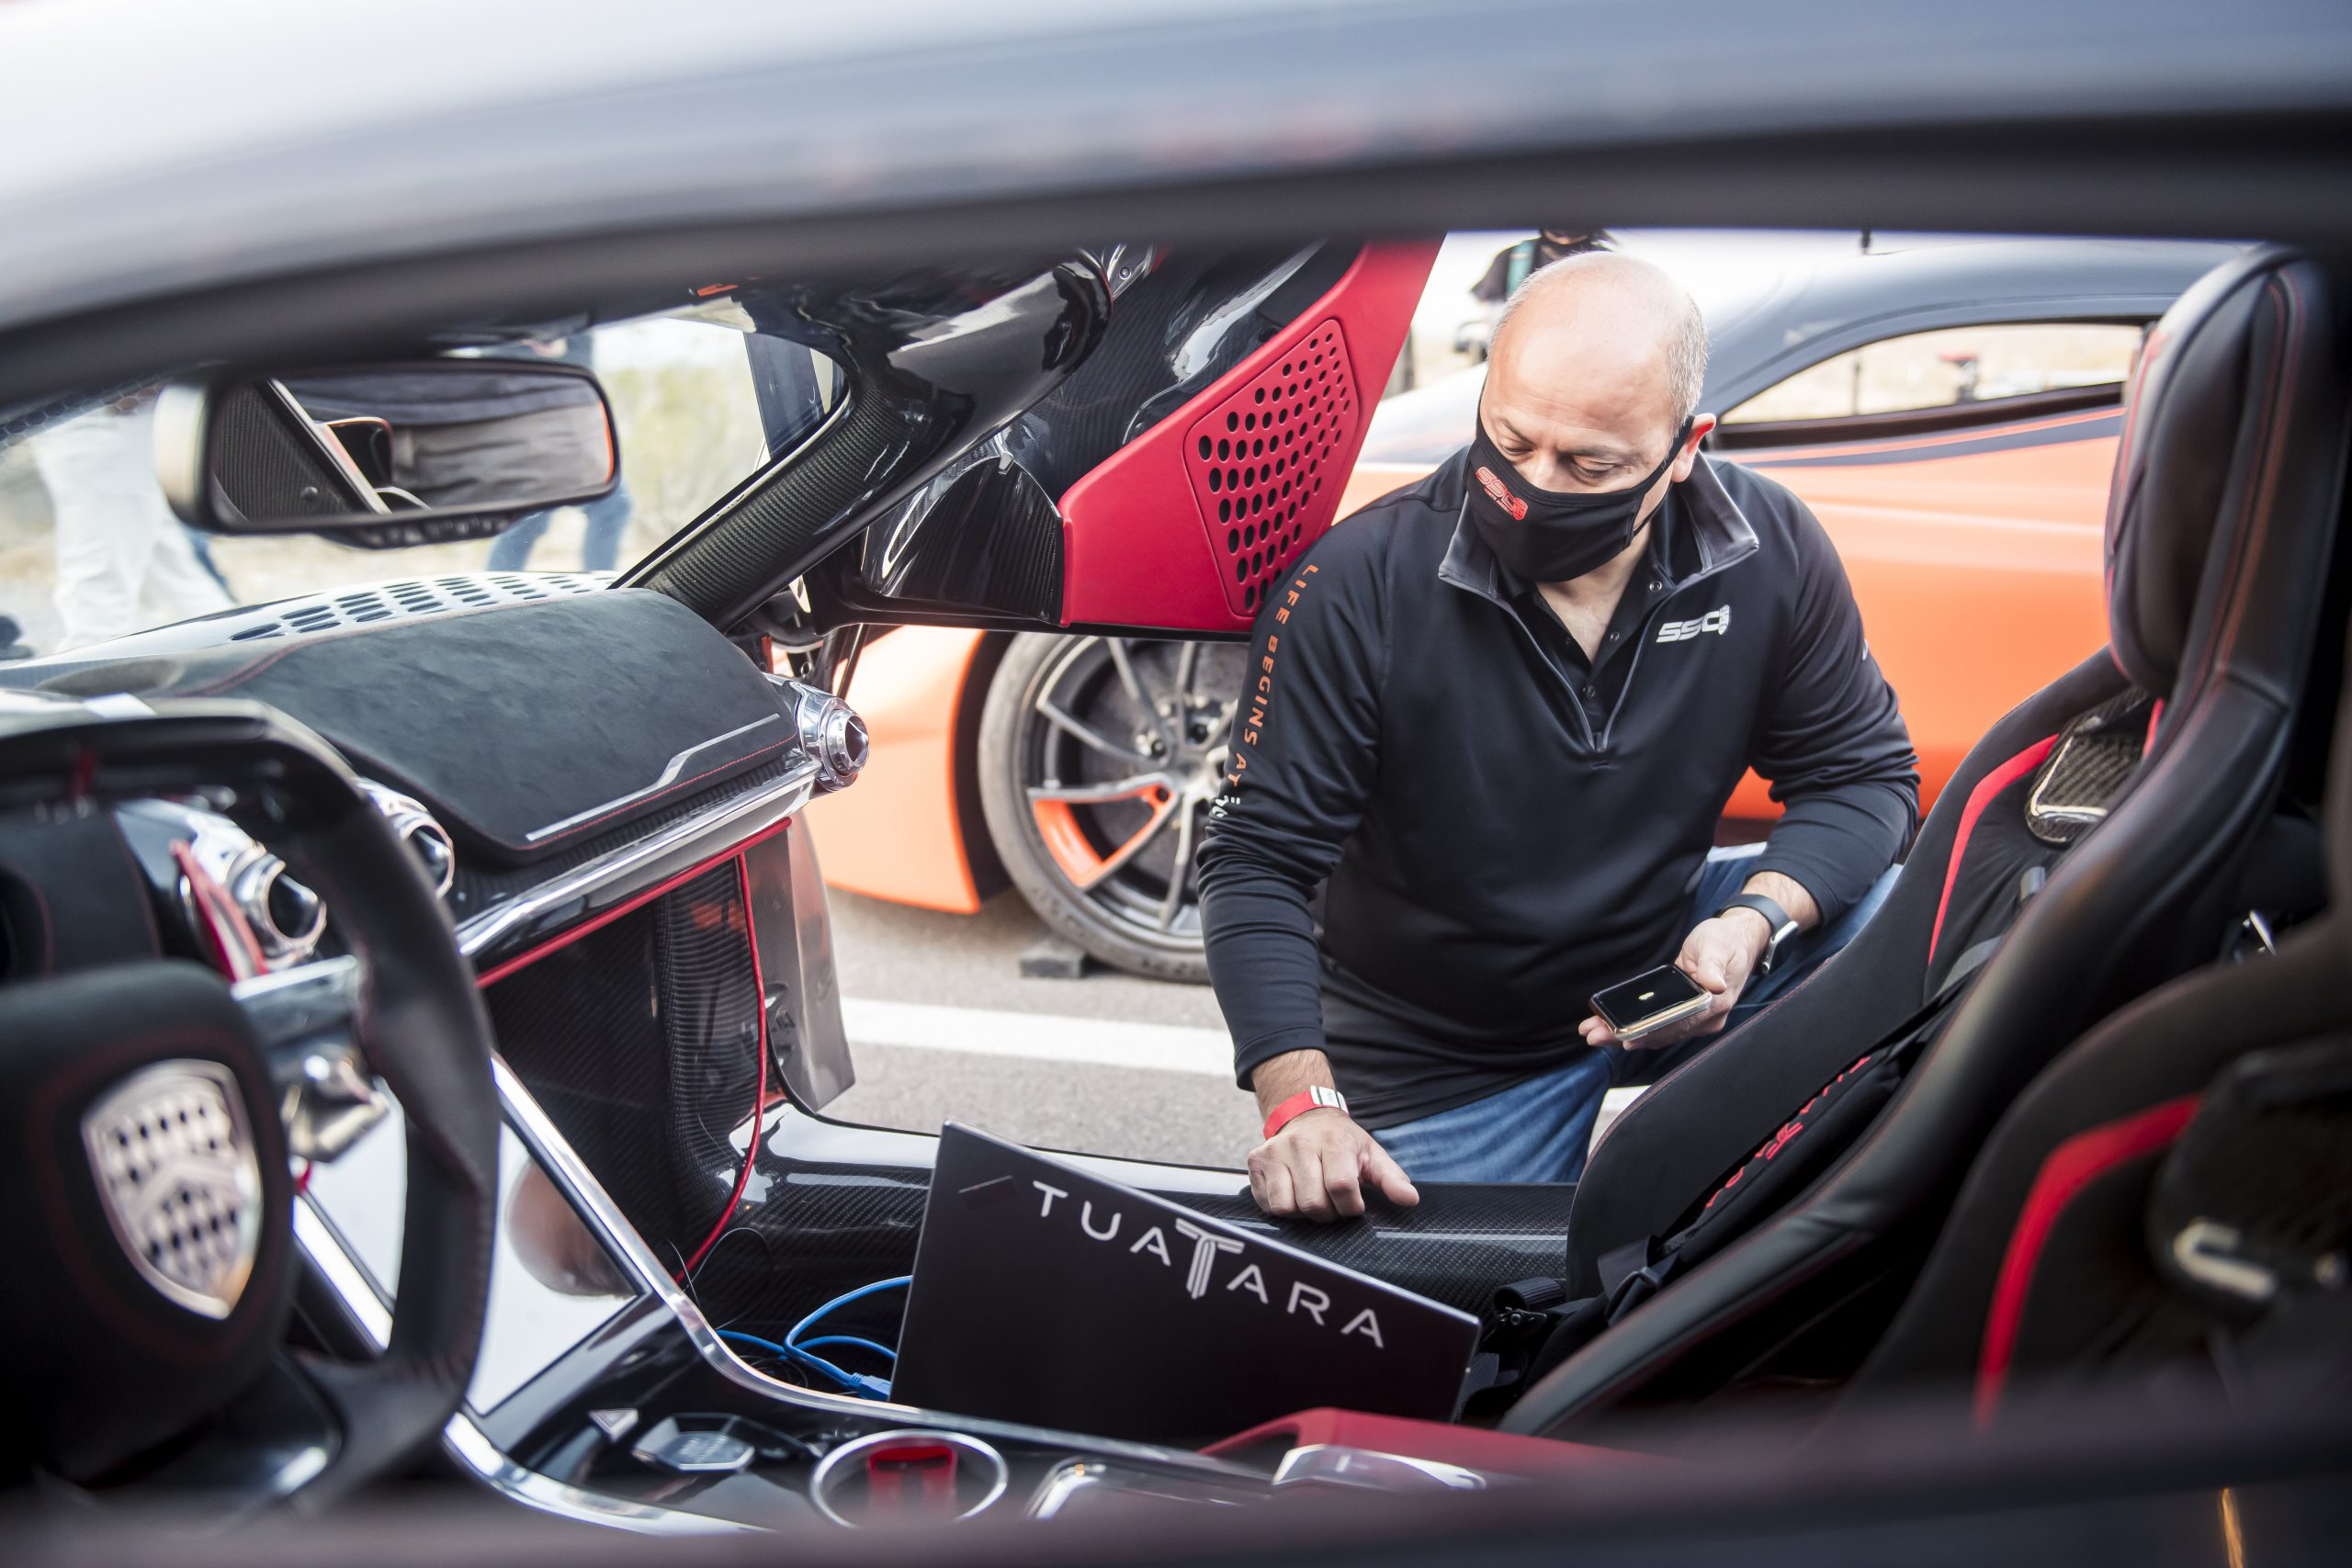 SSC Tuatara Production Car Speed Record engineer check